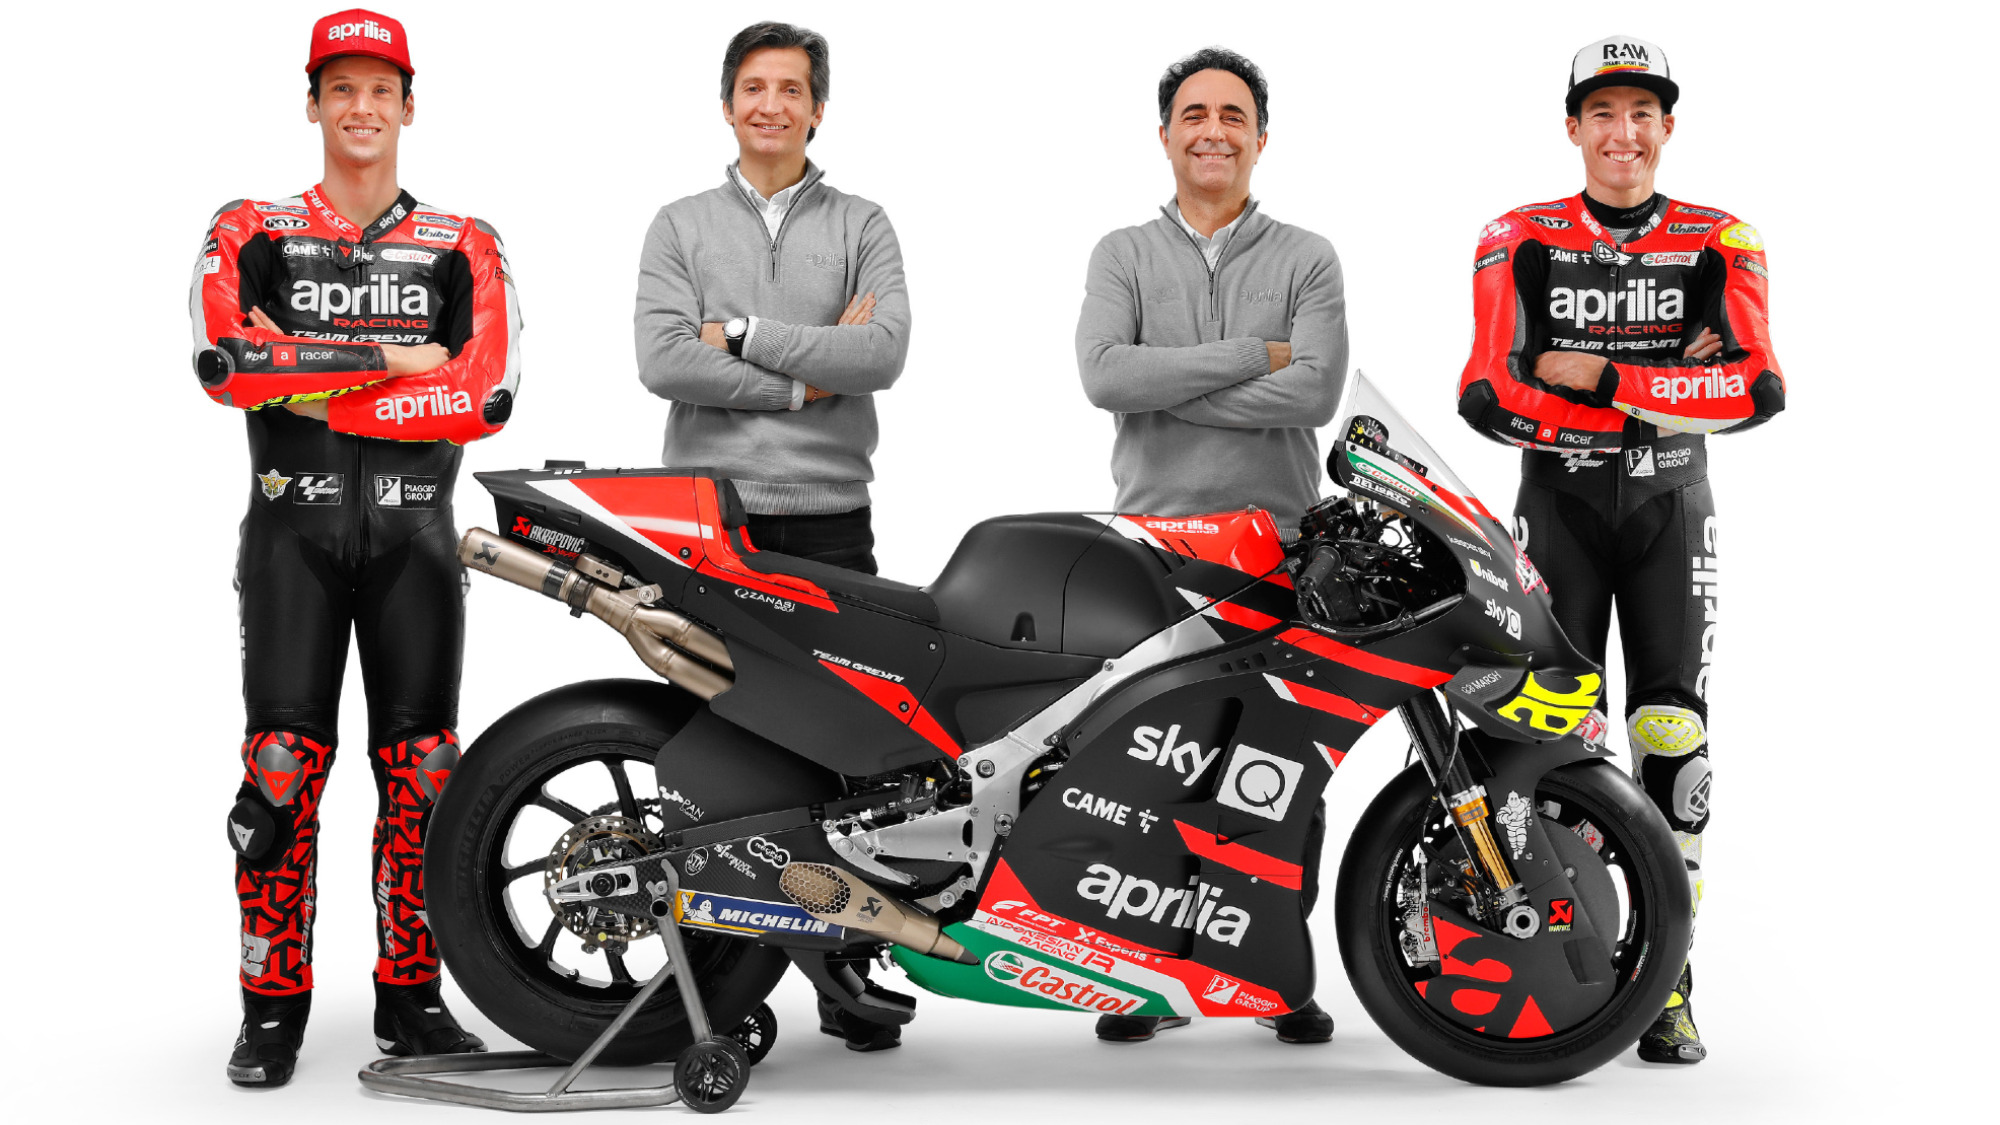 Aprilia 2021: Rivola and Albesiano with Savadori and Espargaro